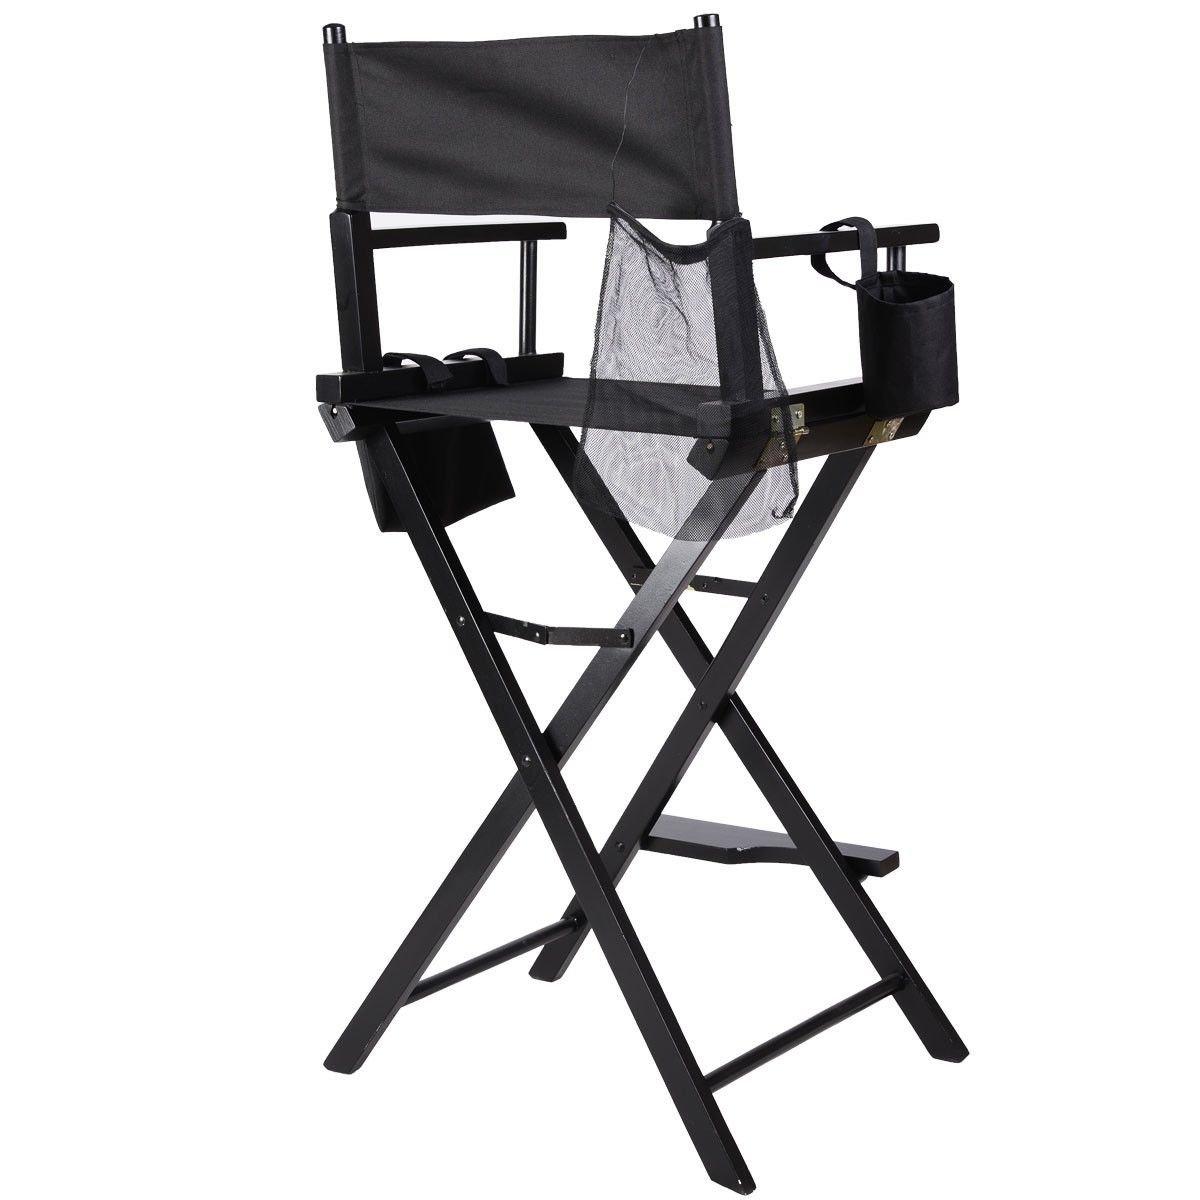 Amazon.com: Black Foldable Professional Makeup Artist Directors Chair w/ Storage Side Bags: Kitchen & Dining